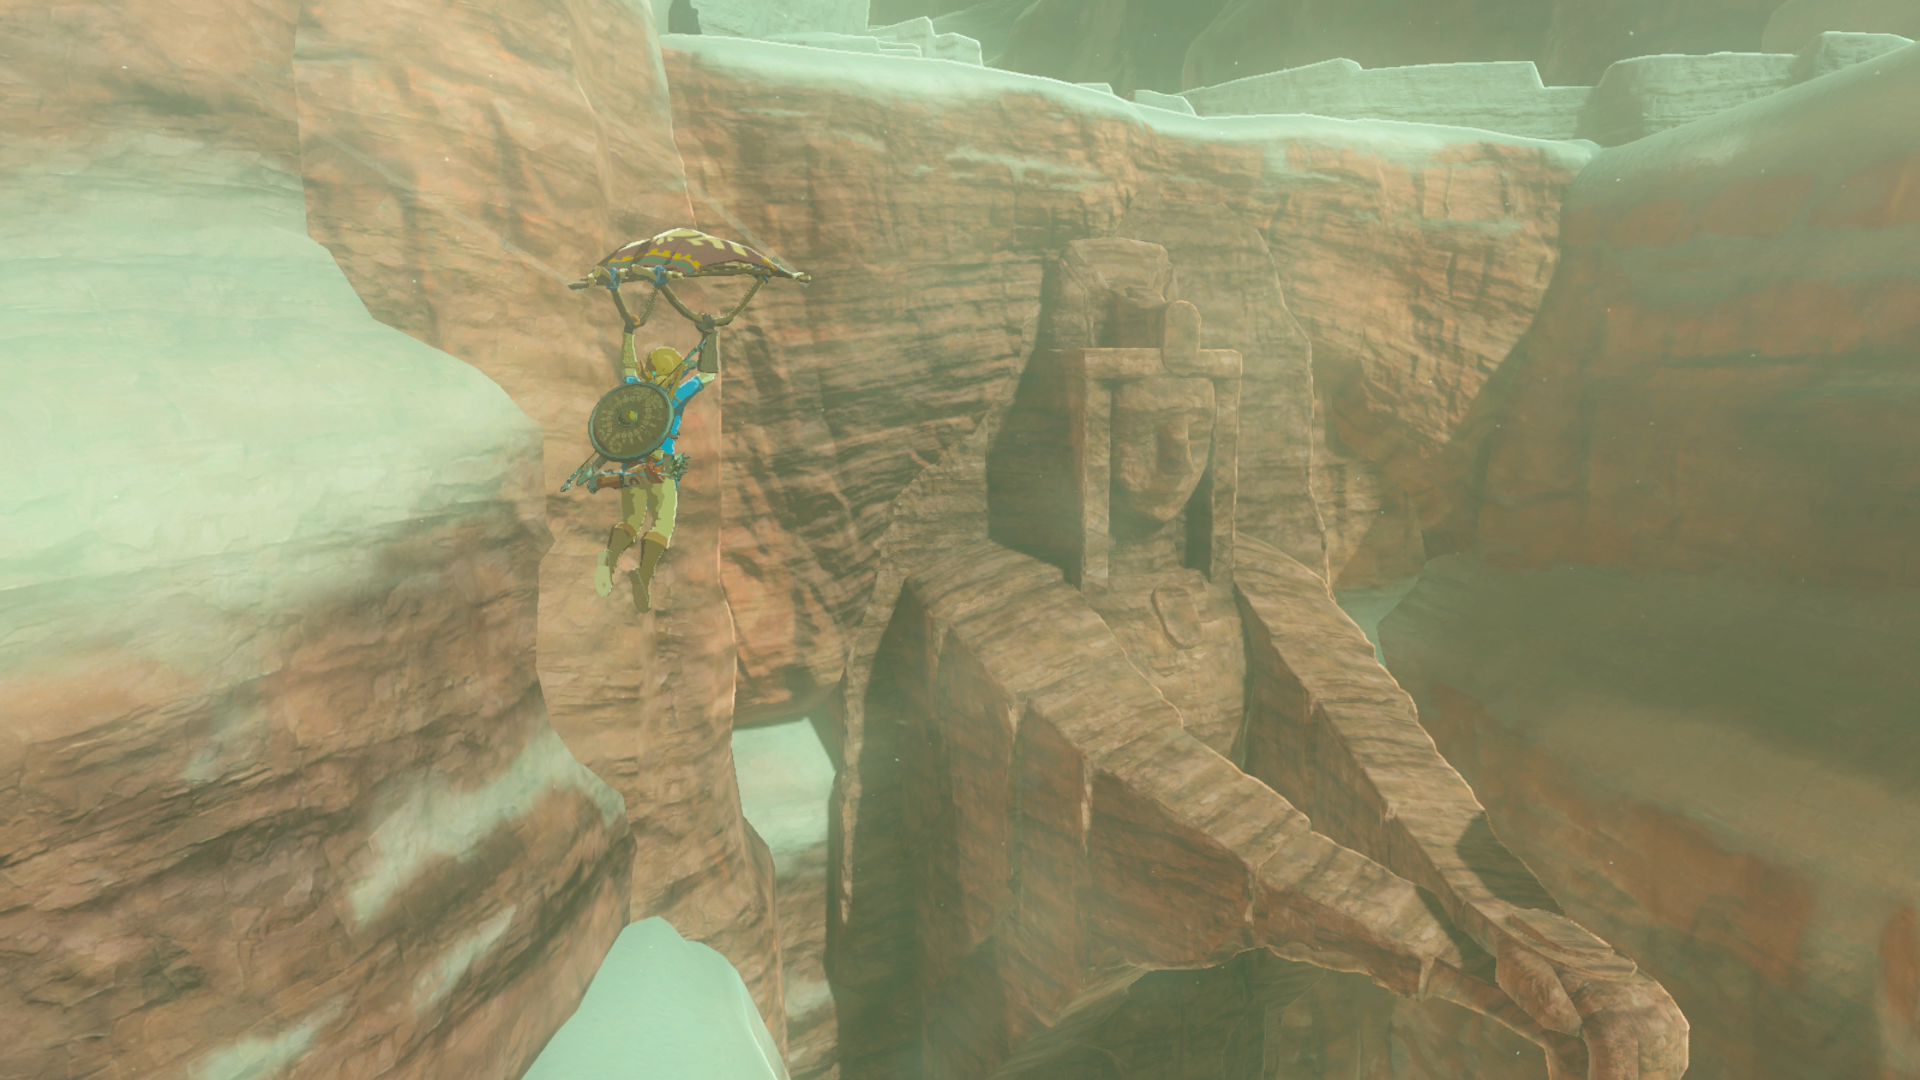 The Legend of Zelda: Breath of the Wild image 37